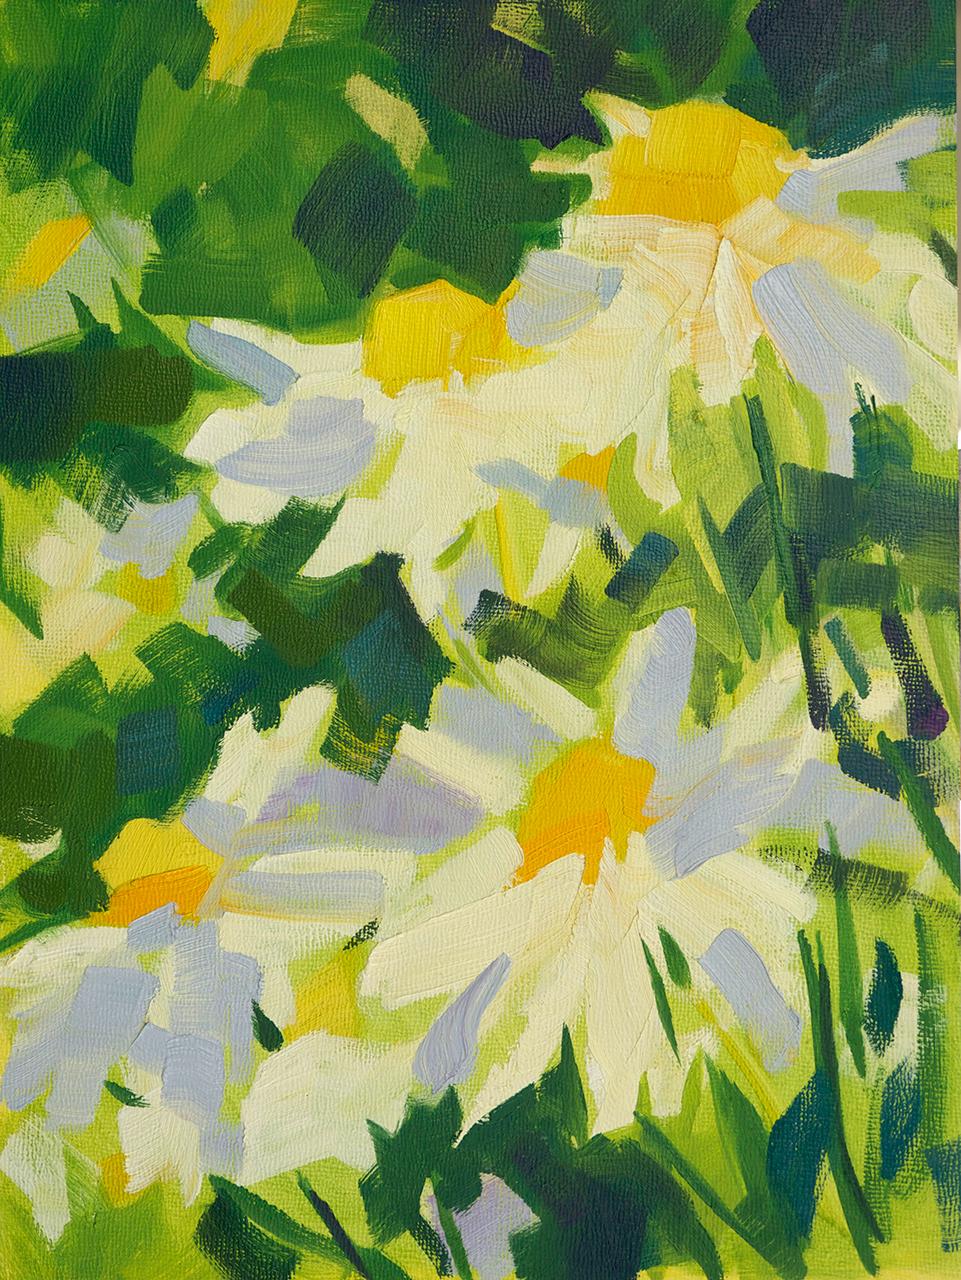 Daisies (#2)